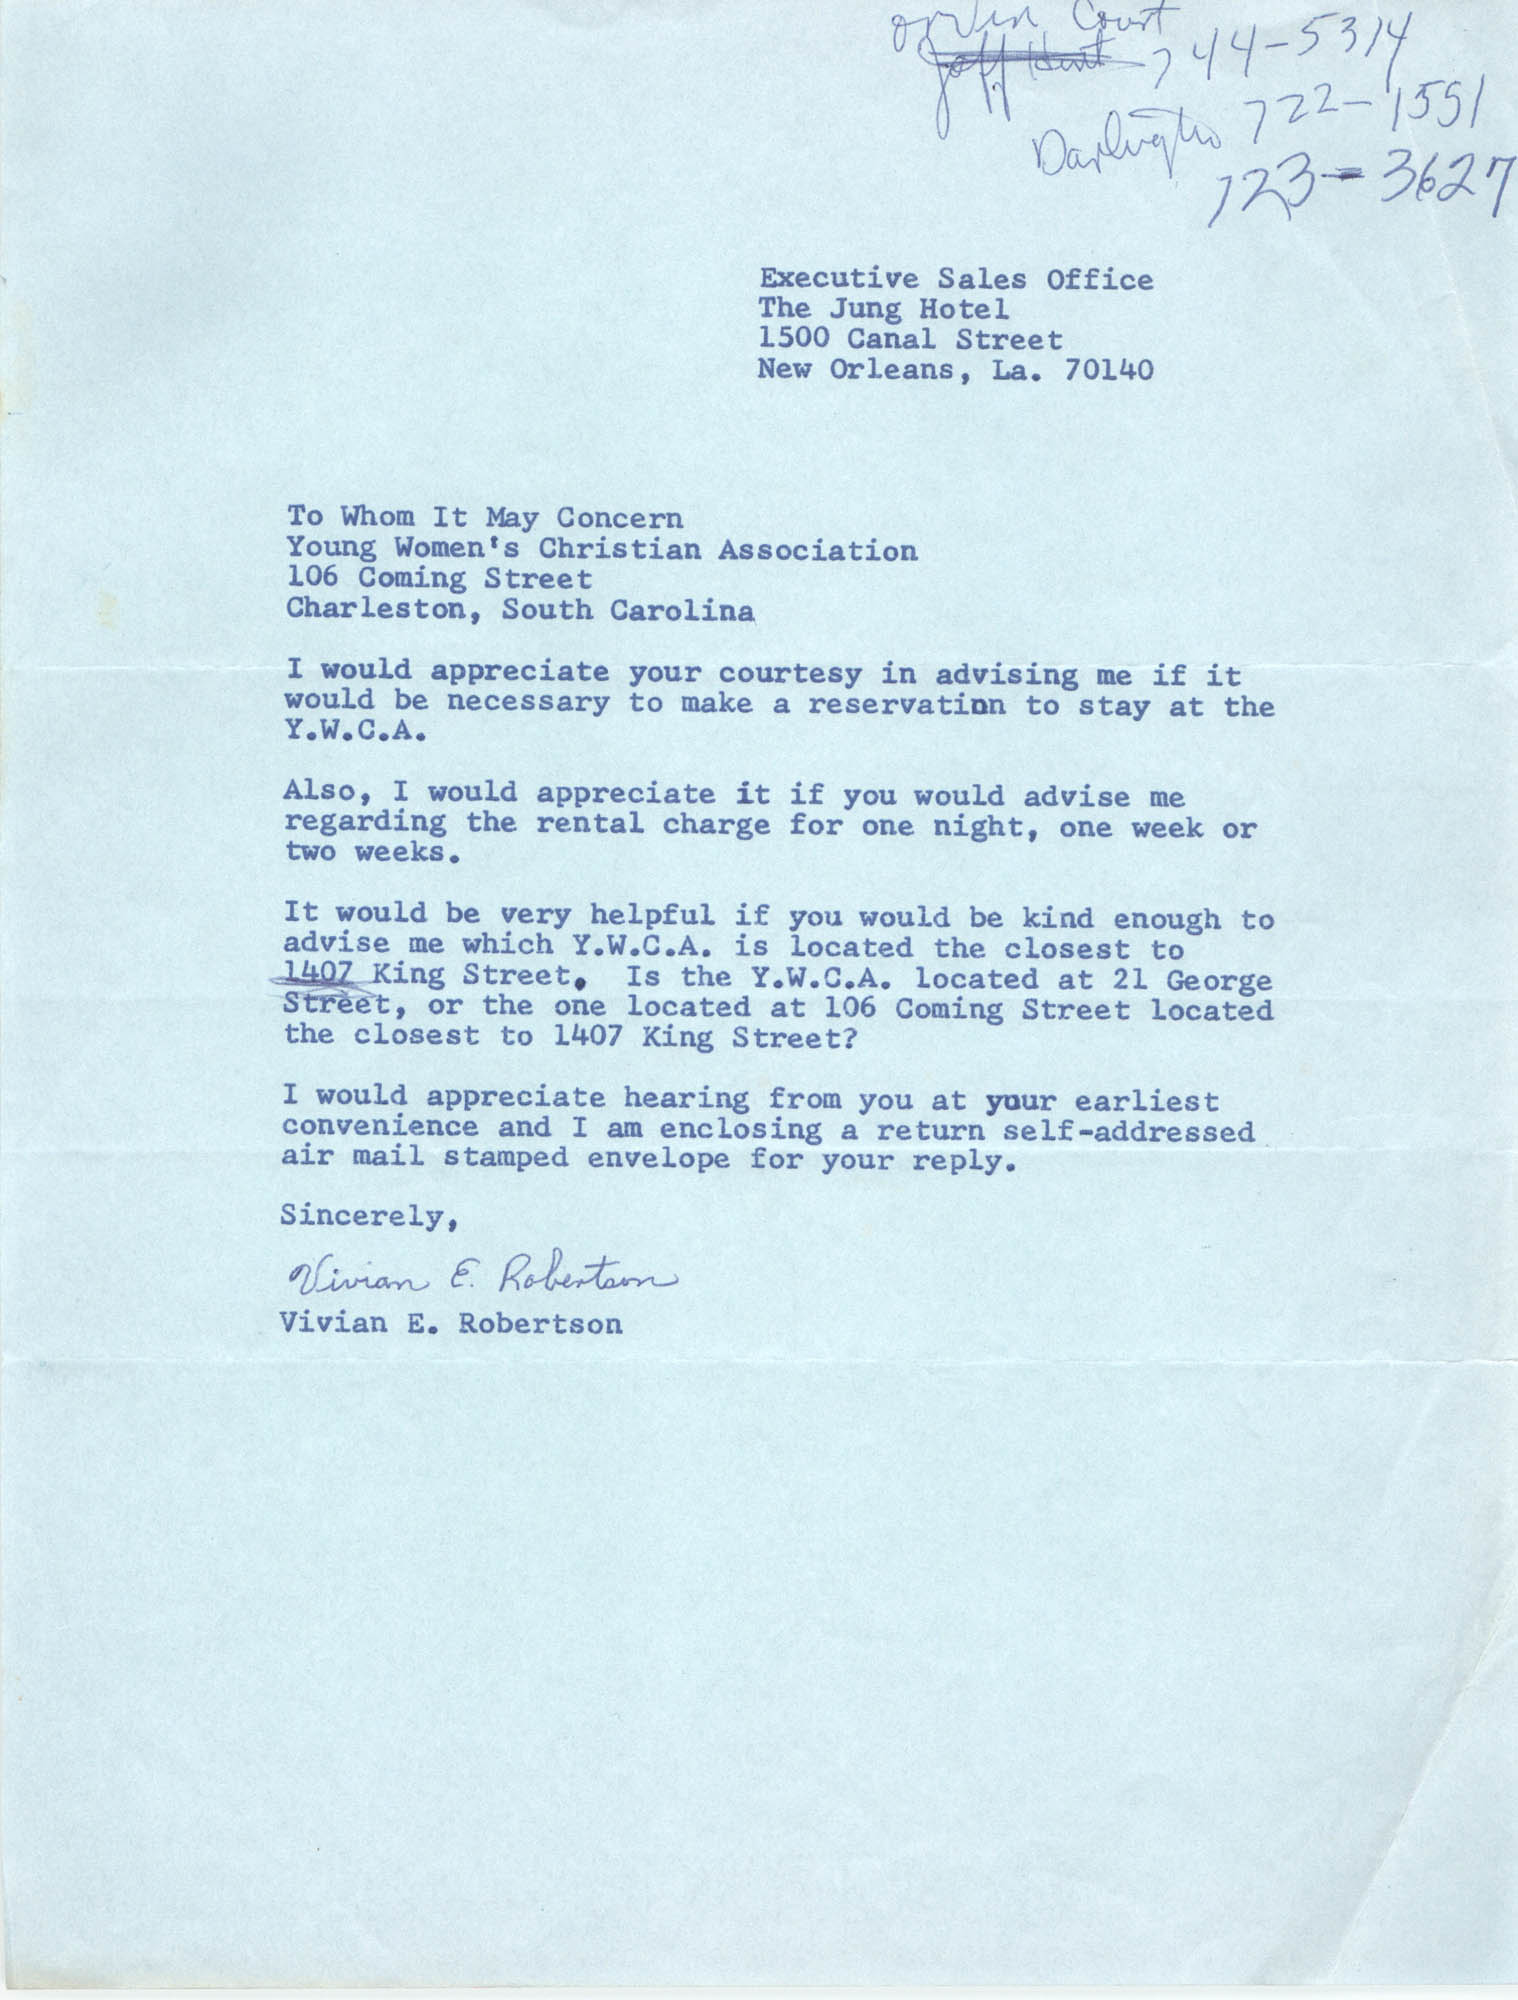 Letter from Vivian E. Robertson